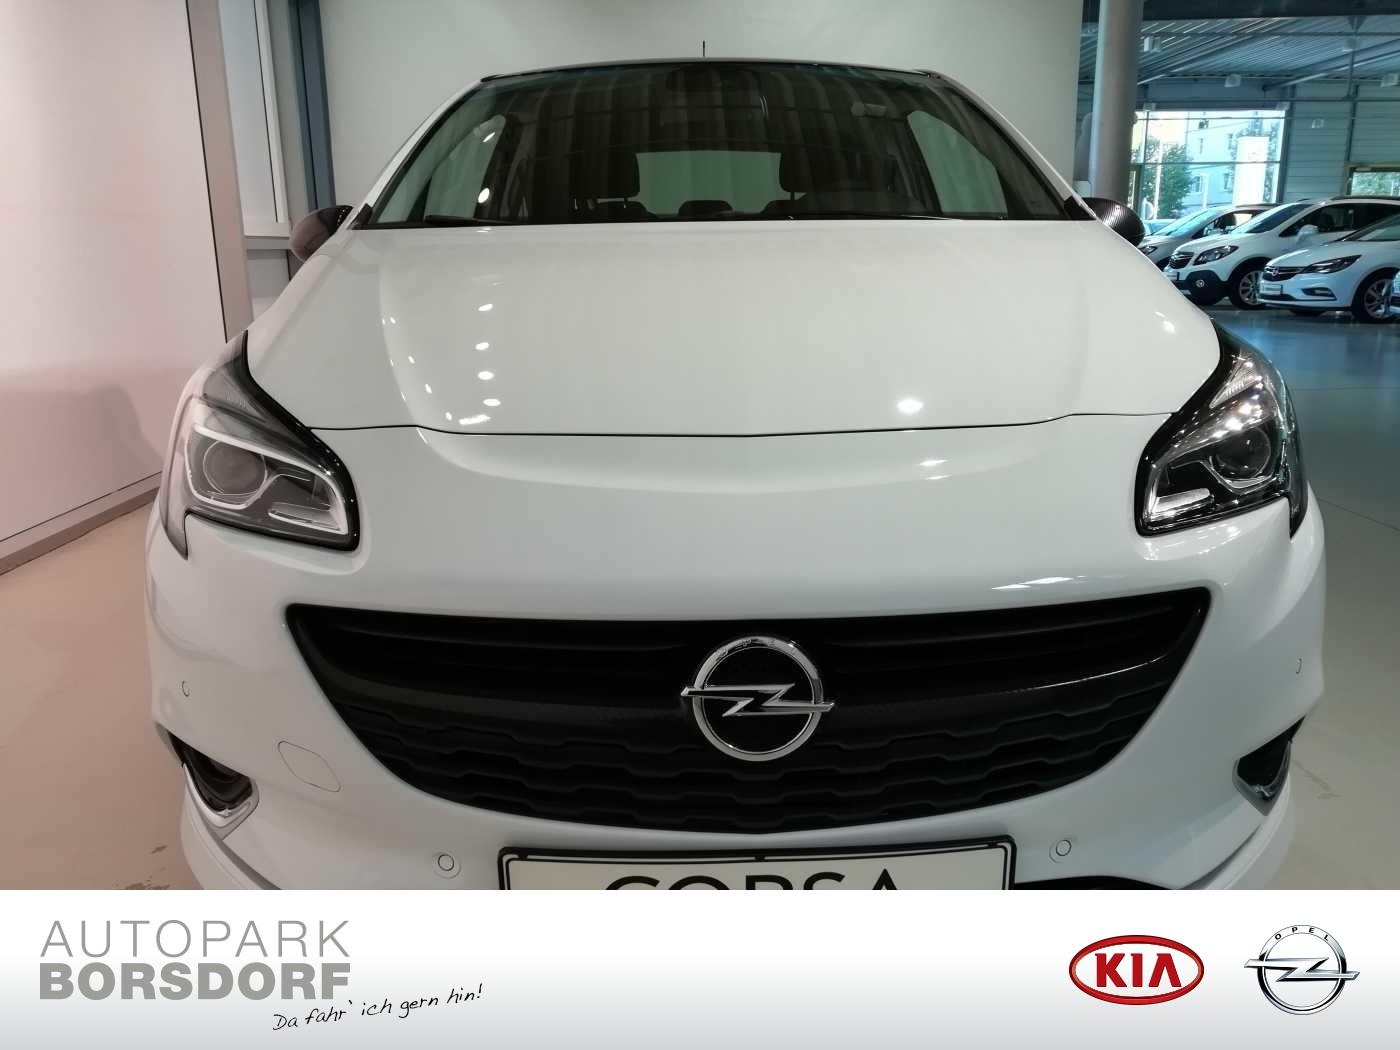 Opel Corsa E 1.4 Turbo Color Edition ecoFlex (EURO 6d-TEMP), Jahr 2019, Benzin